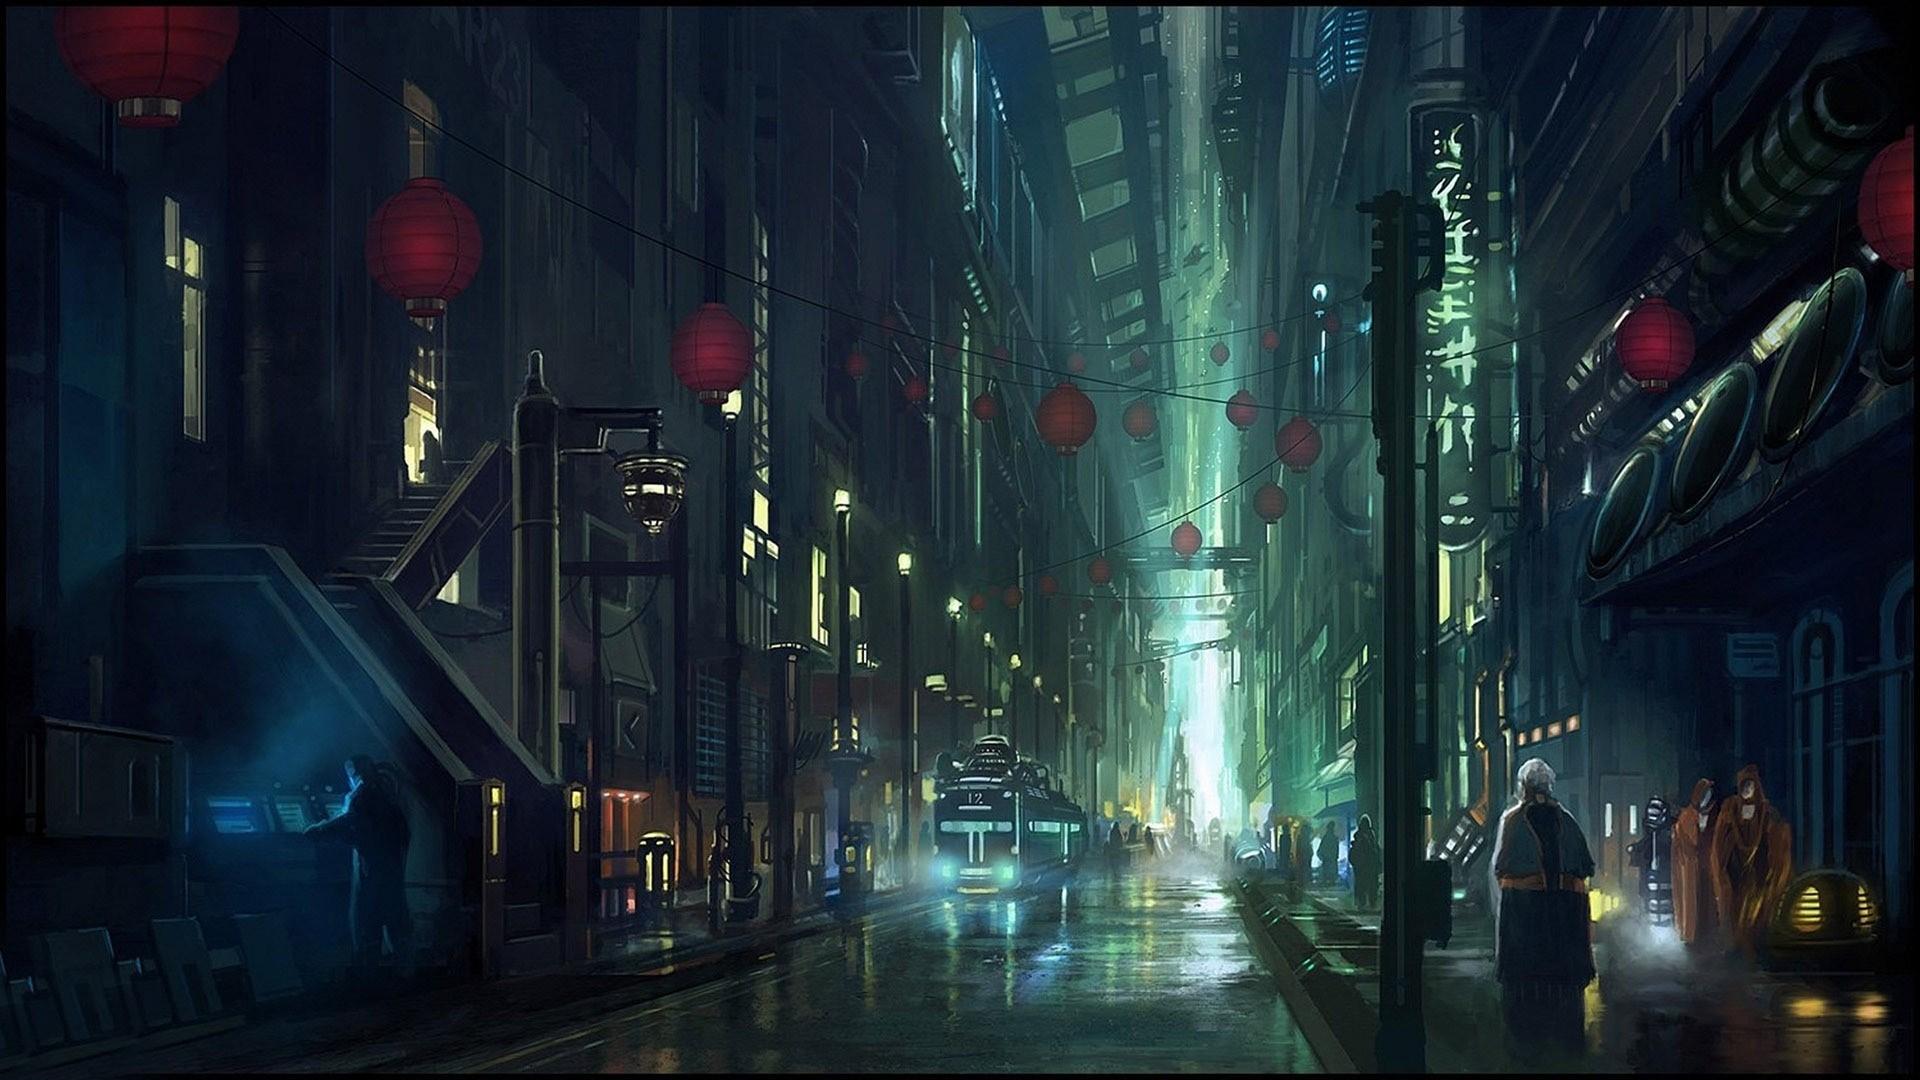 Cyberpunk City Art Wallpaper theme